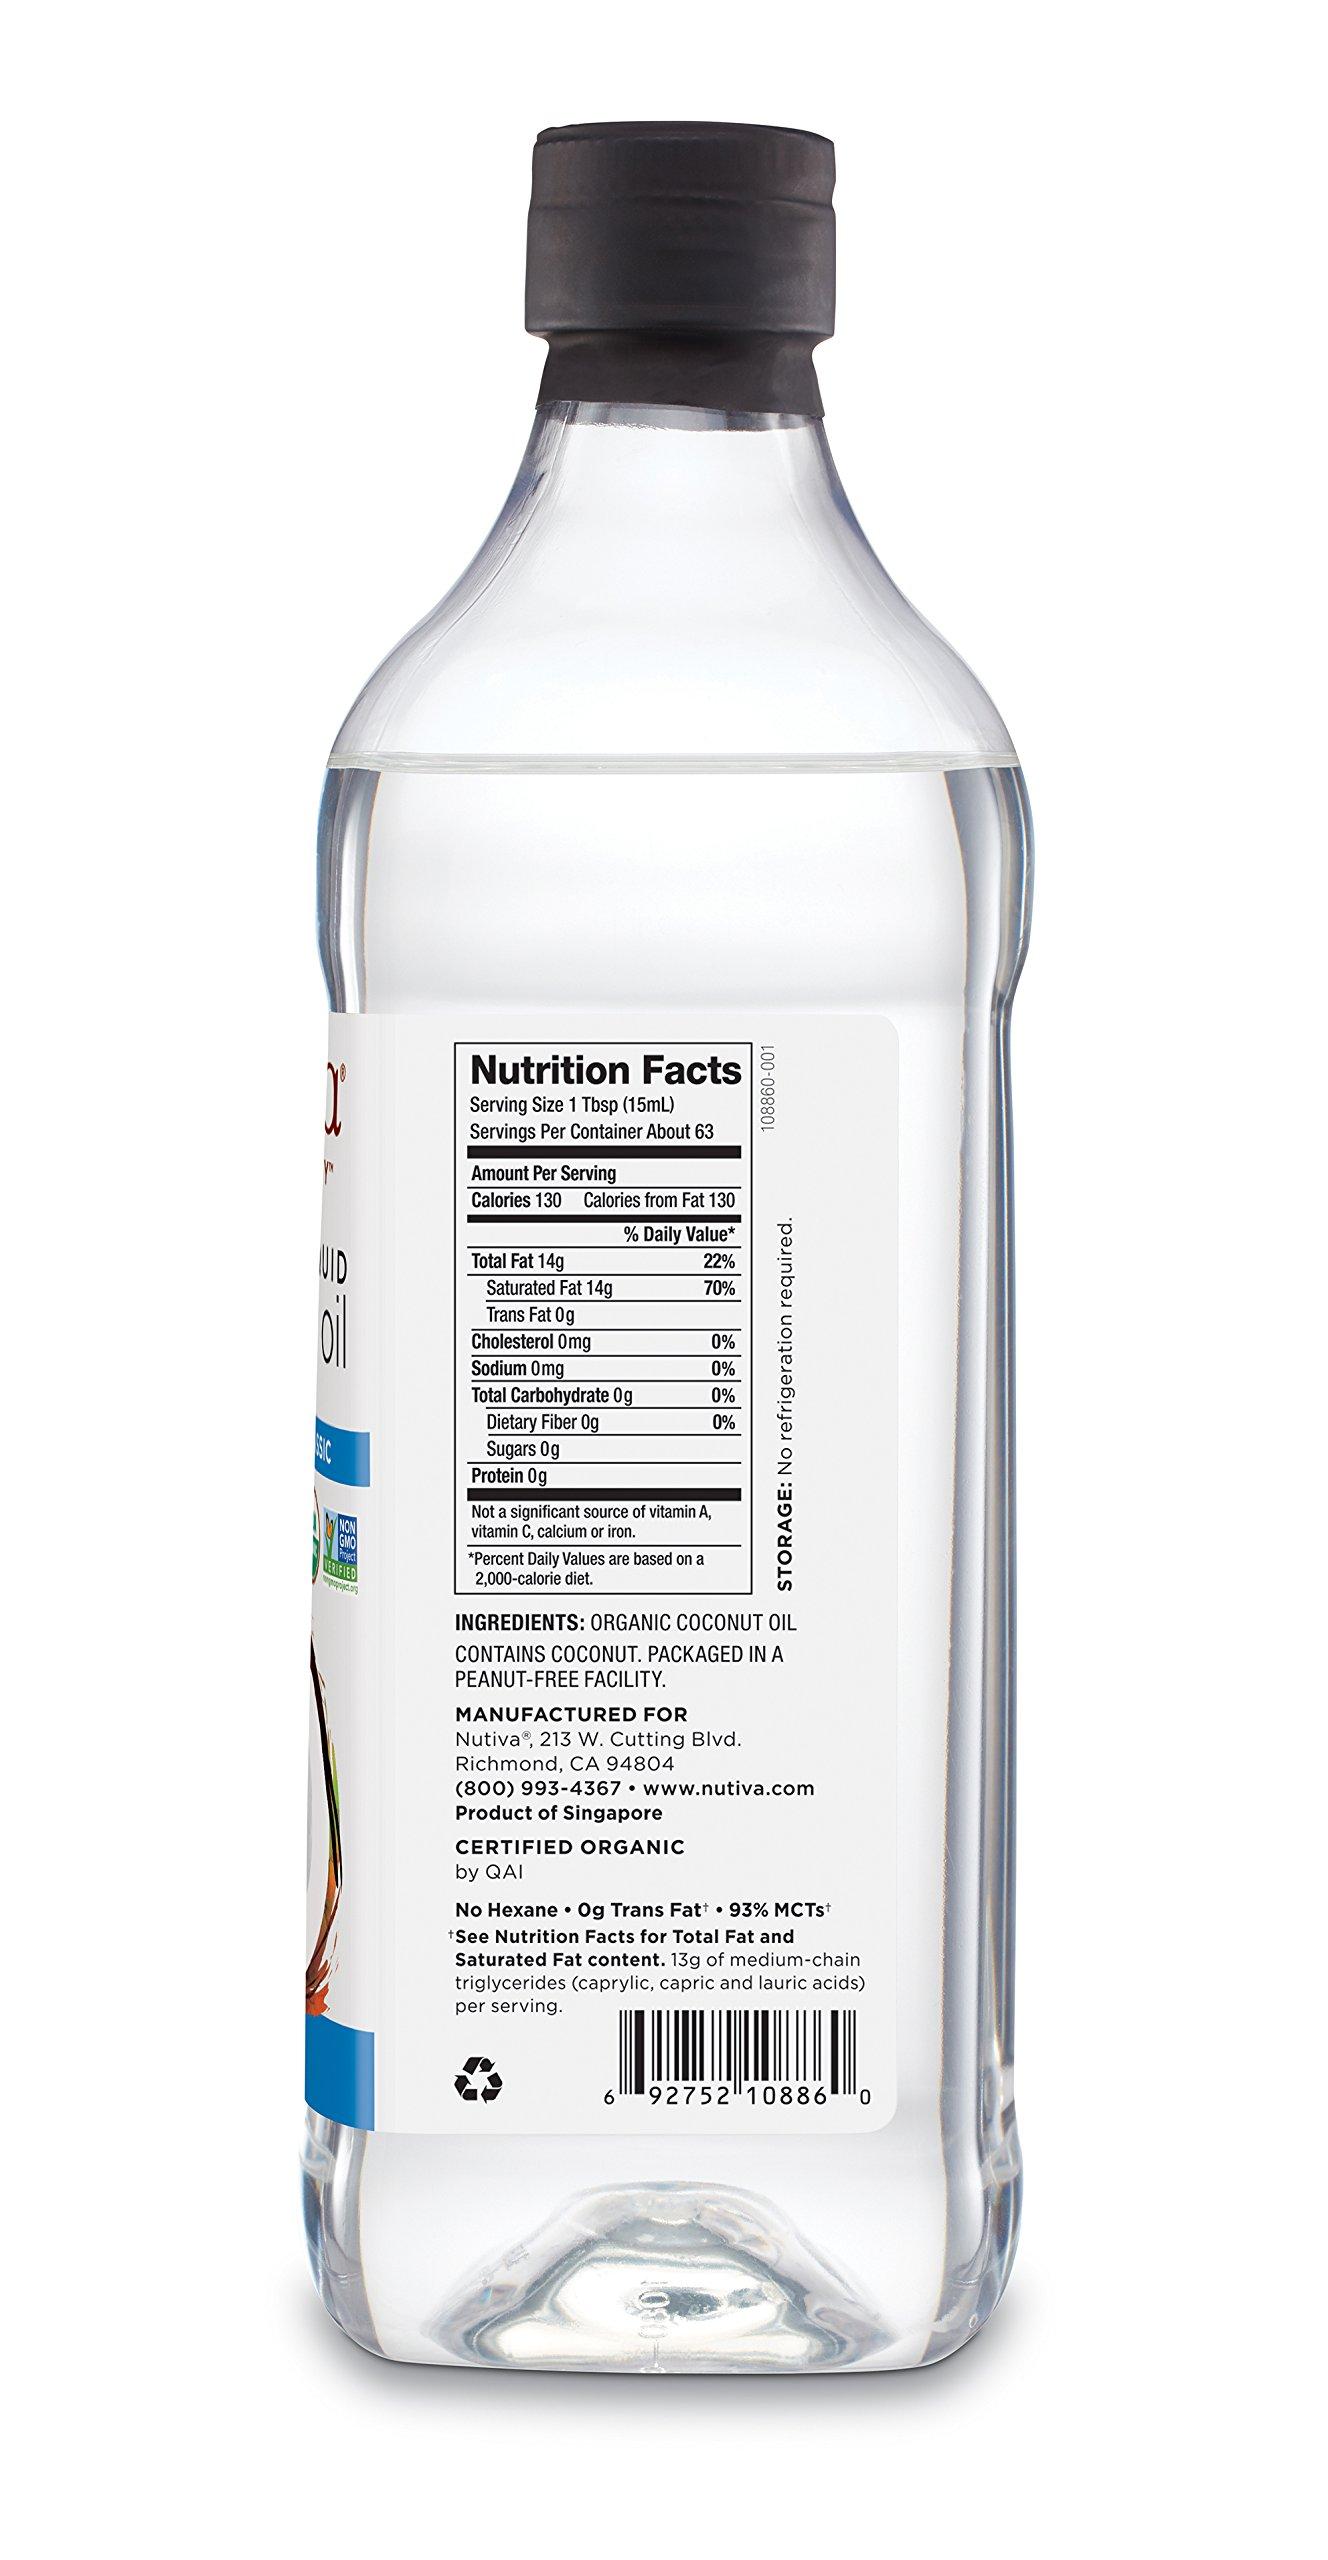 Nutiva Organic, Unrefined, Liquid Coconut Oil from Fresh, non-GMO, Sustainably Farmed Coconuts, 32-ounce by Nutiva (Image #11)